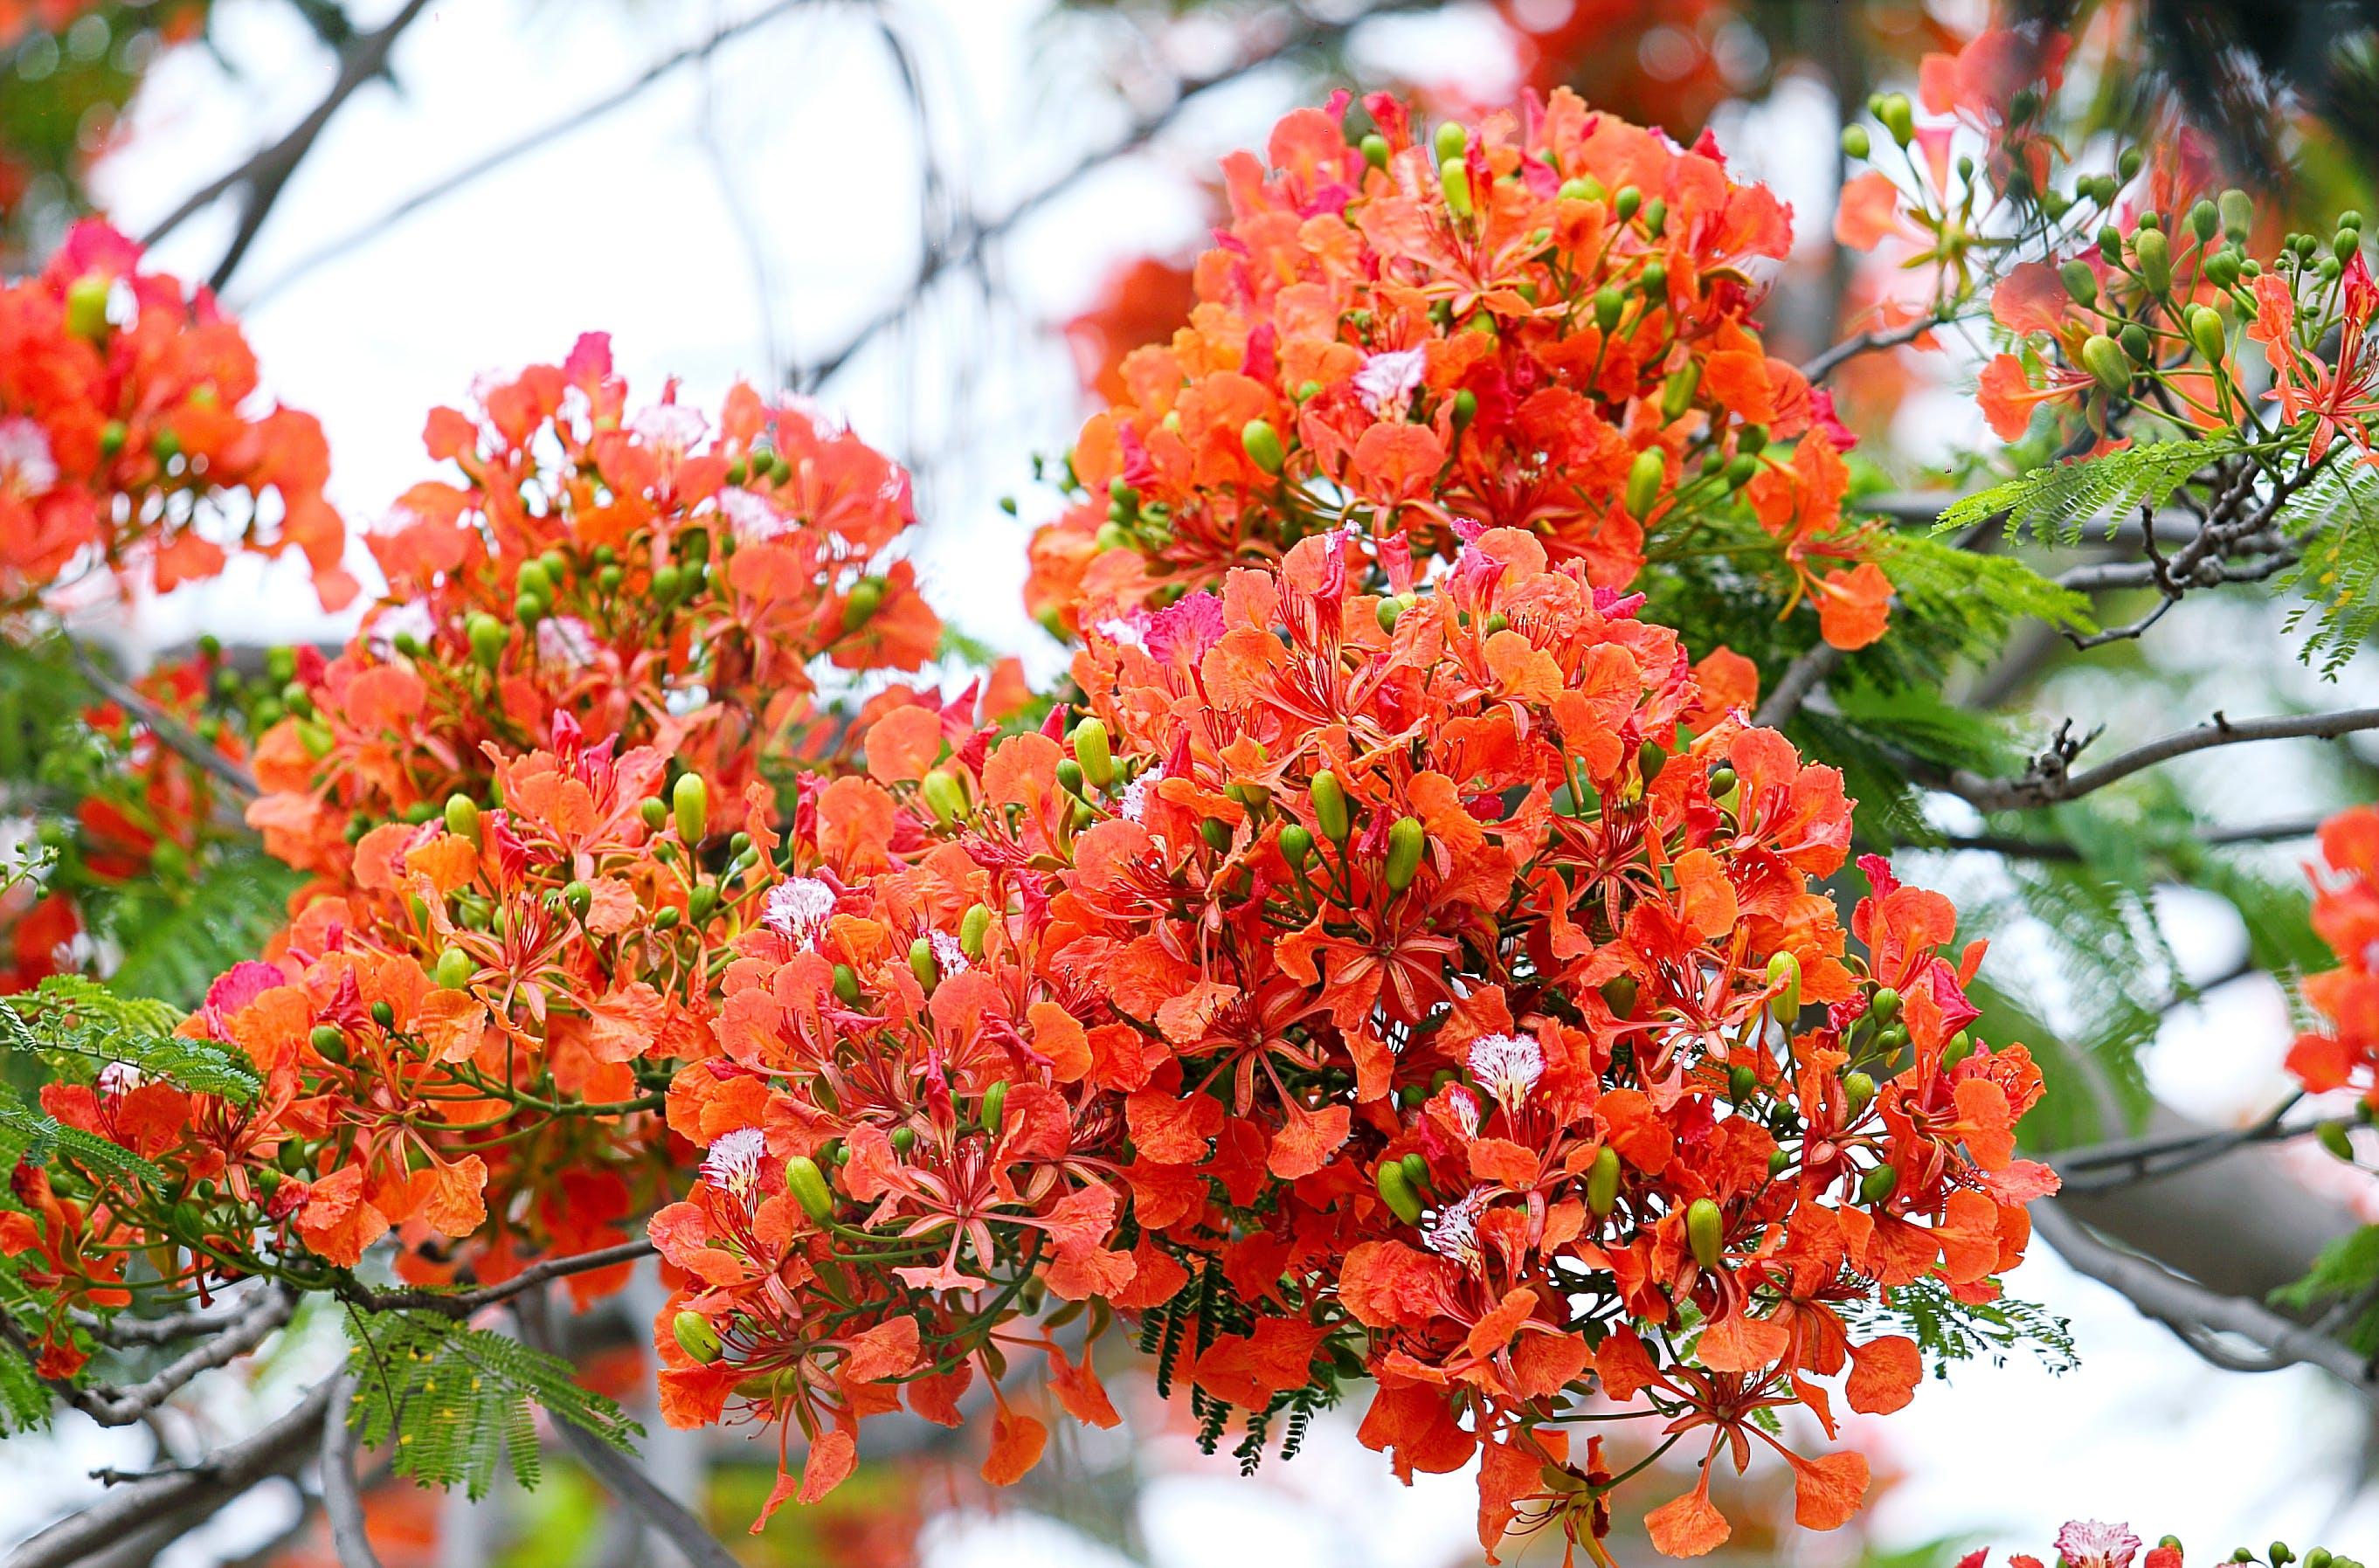 Shallow Focus Photography of Orange Flowers